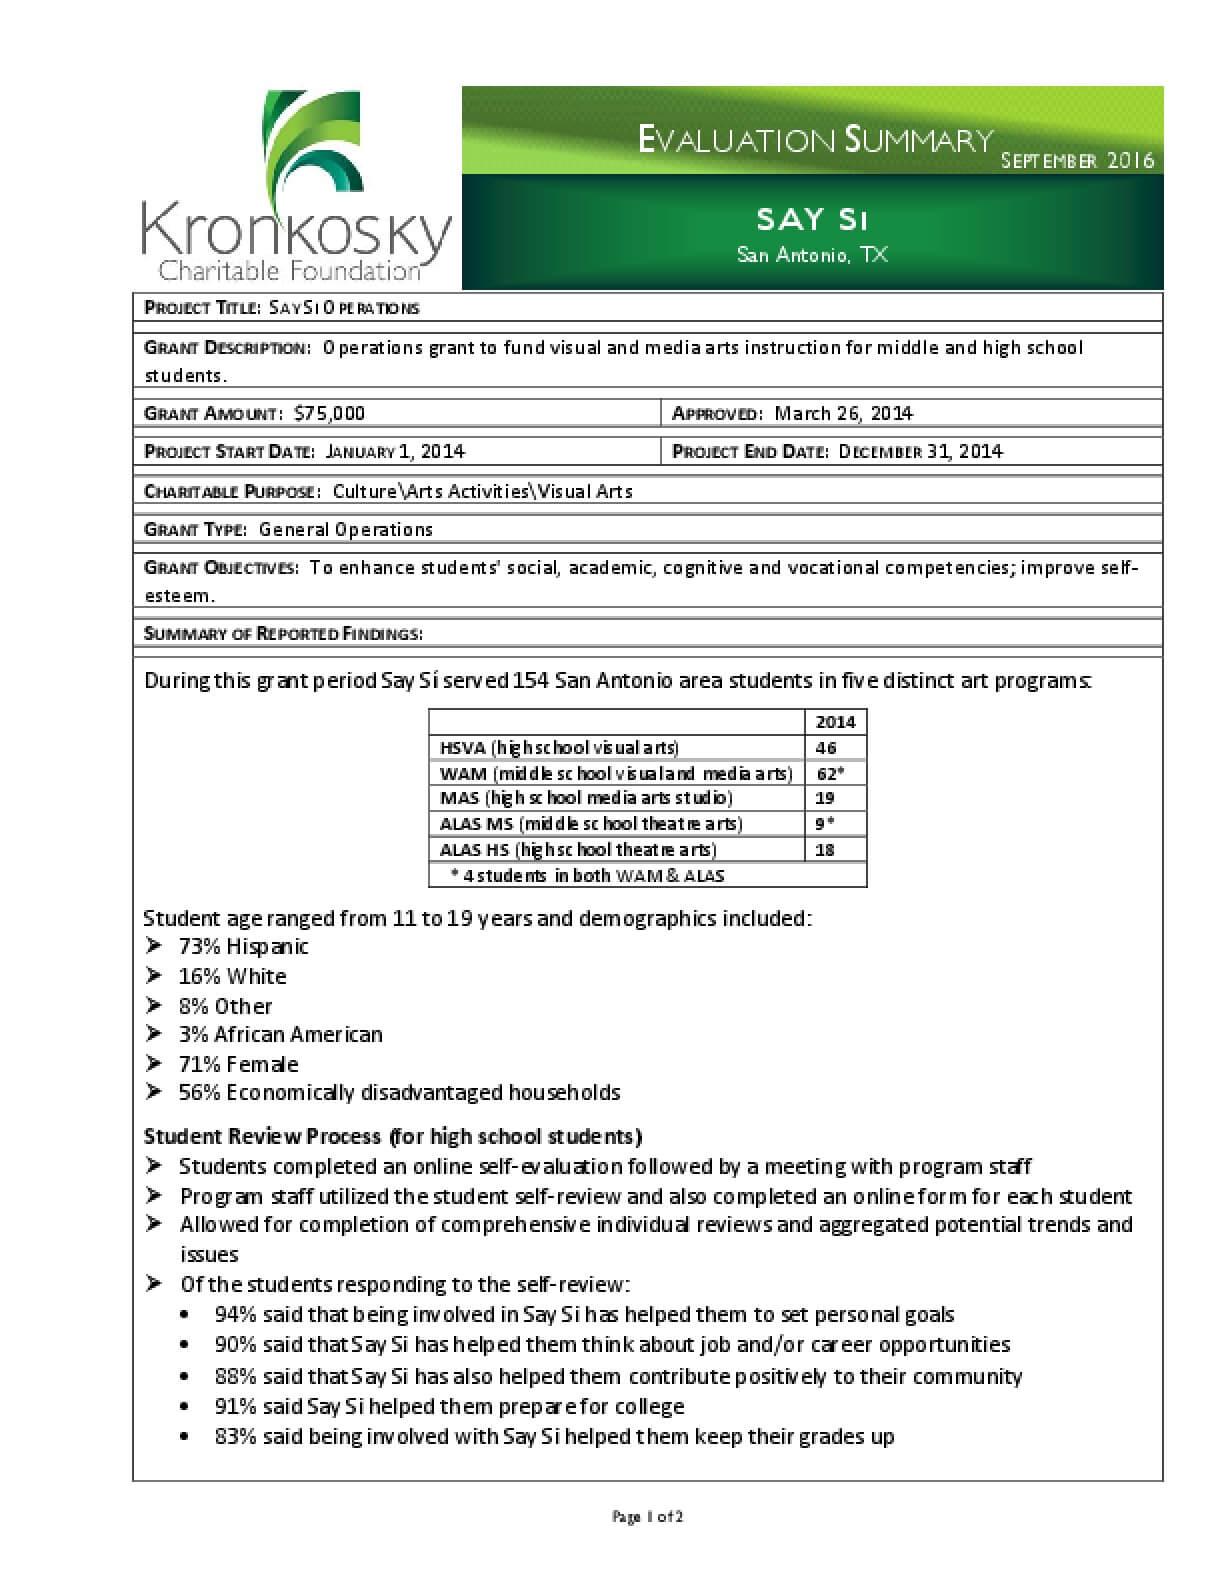 Say Si Evaluation Summary